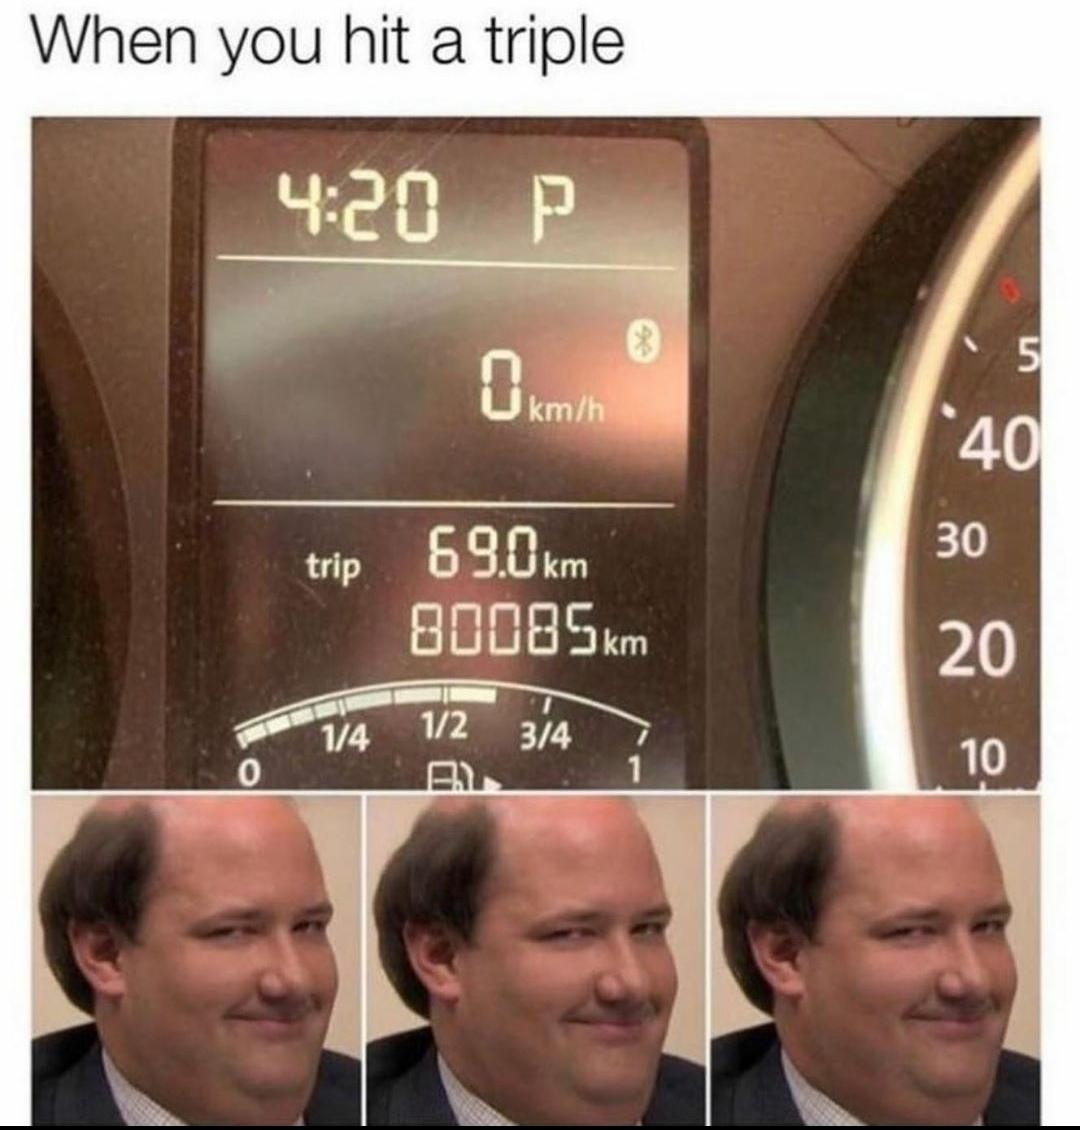 80085 - meme